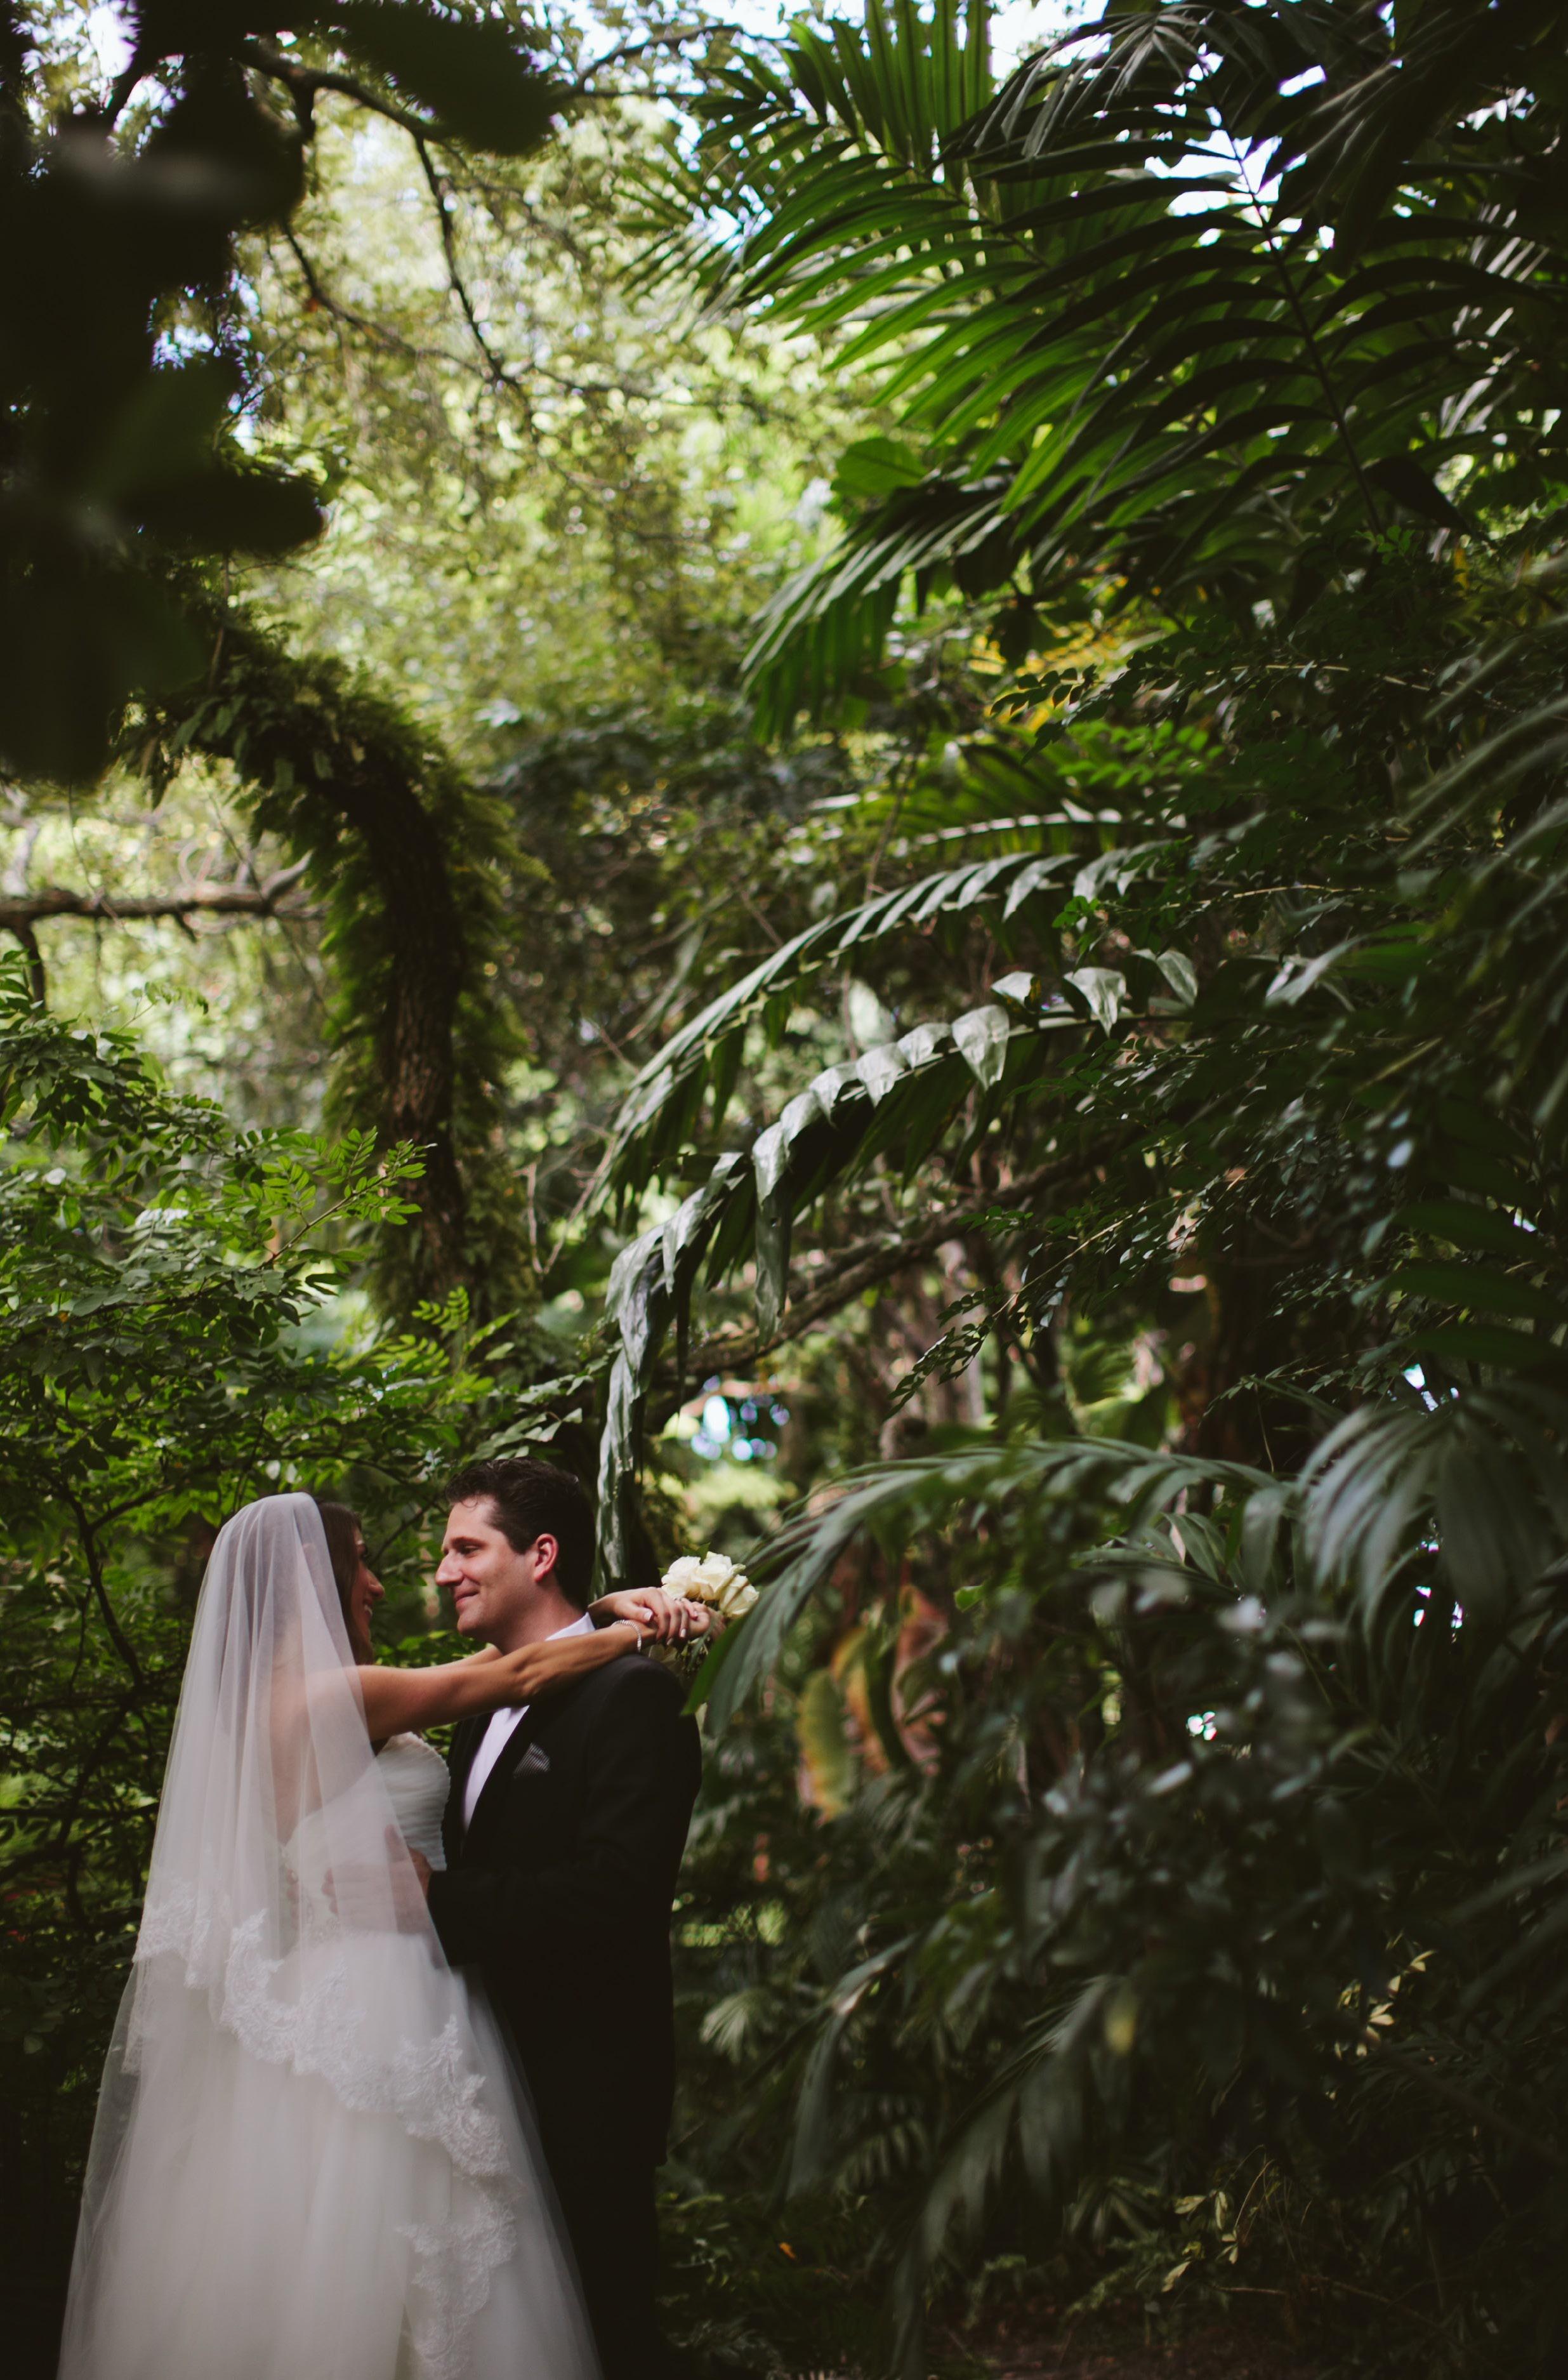 Meli + Mike Coconut Grove Wedding at Villa Woodbine34.jpg